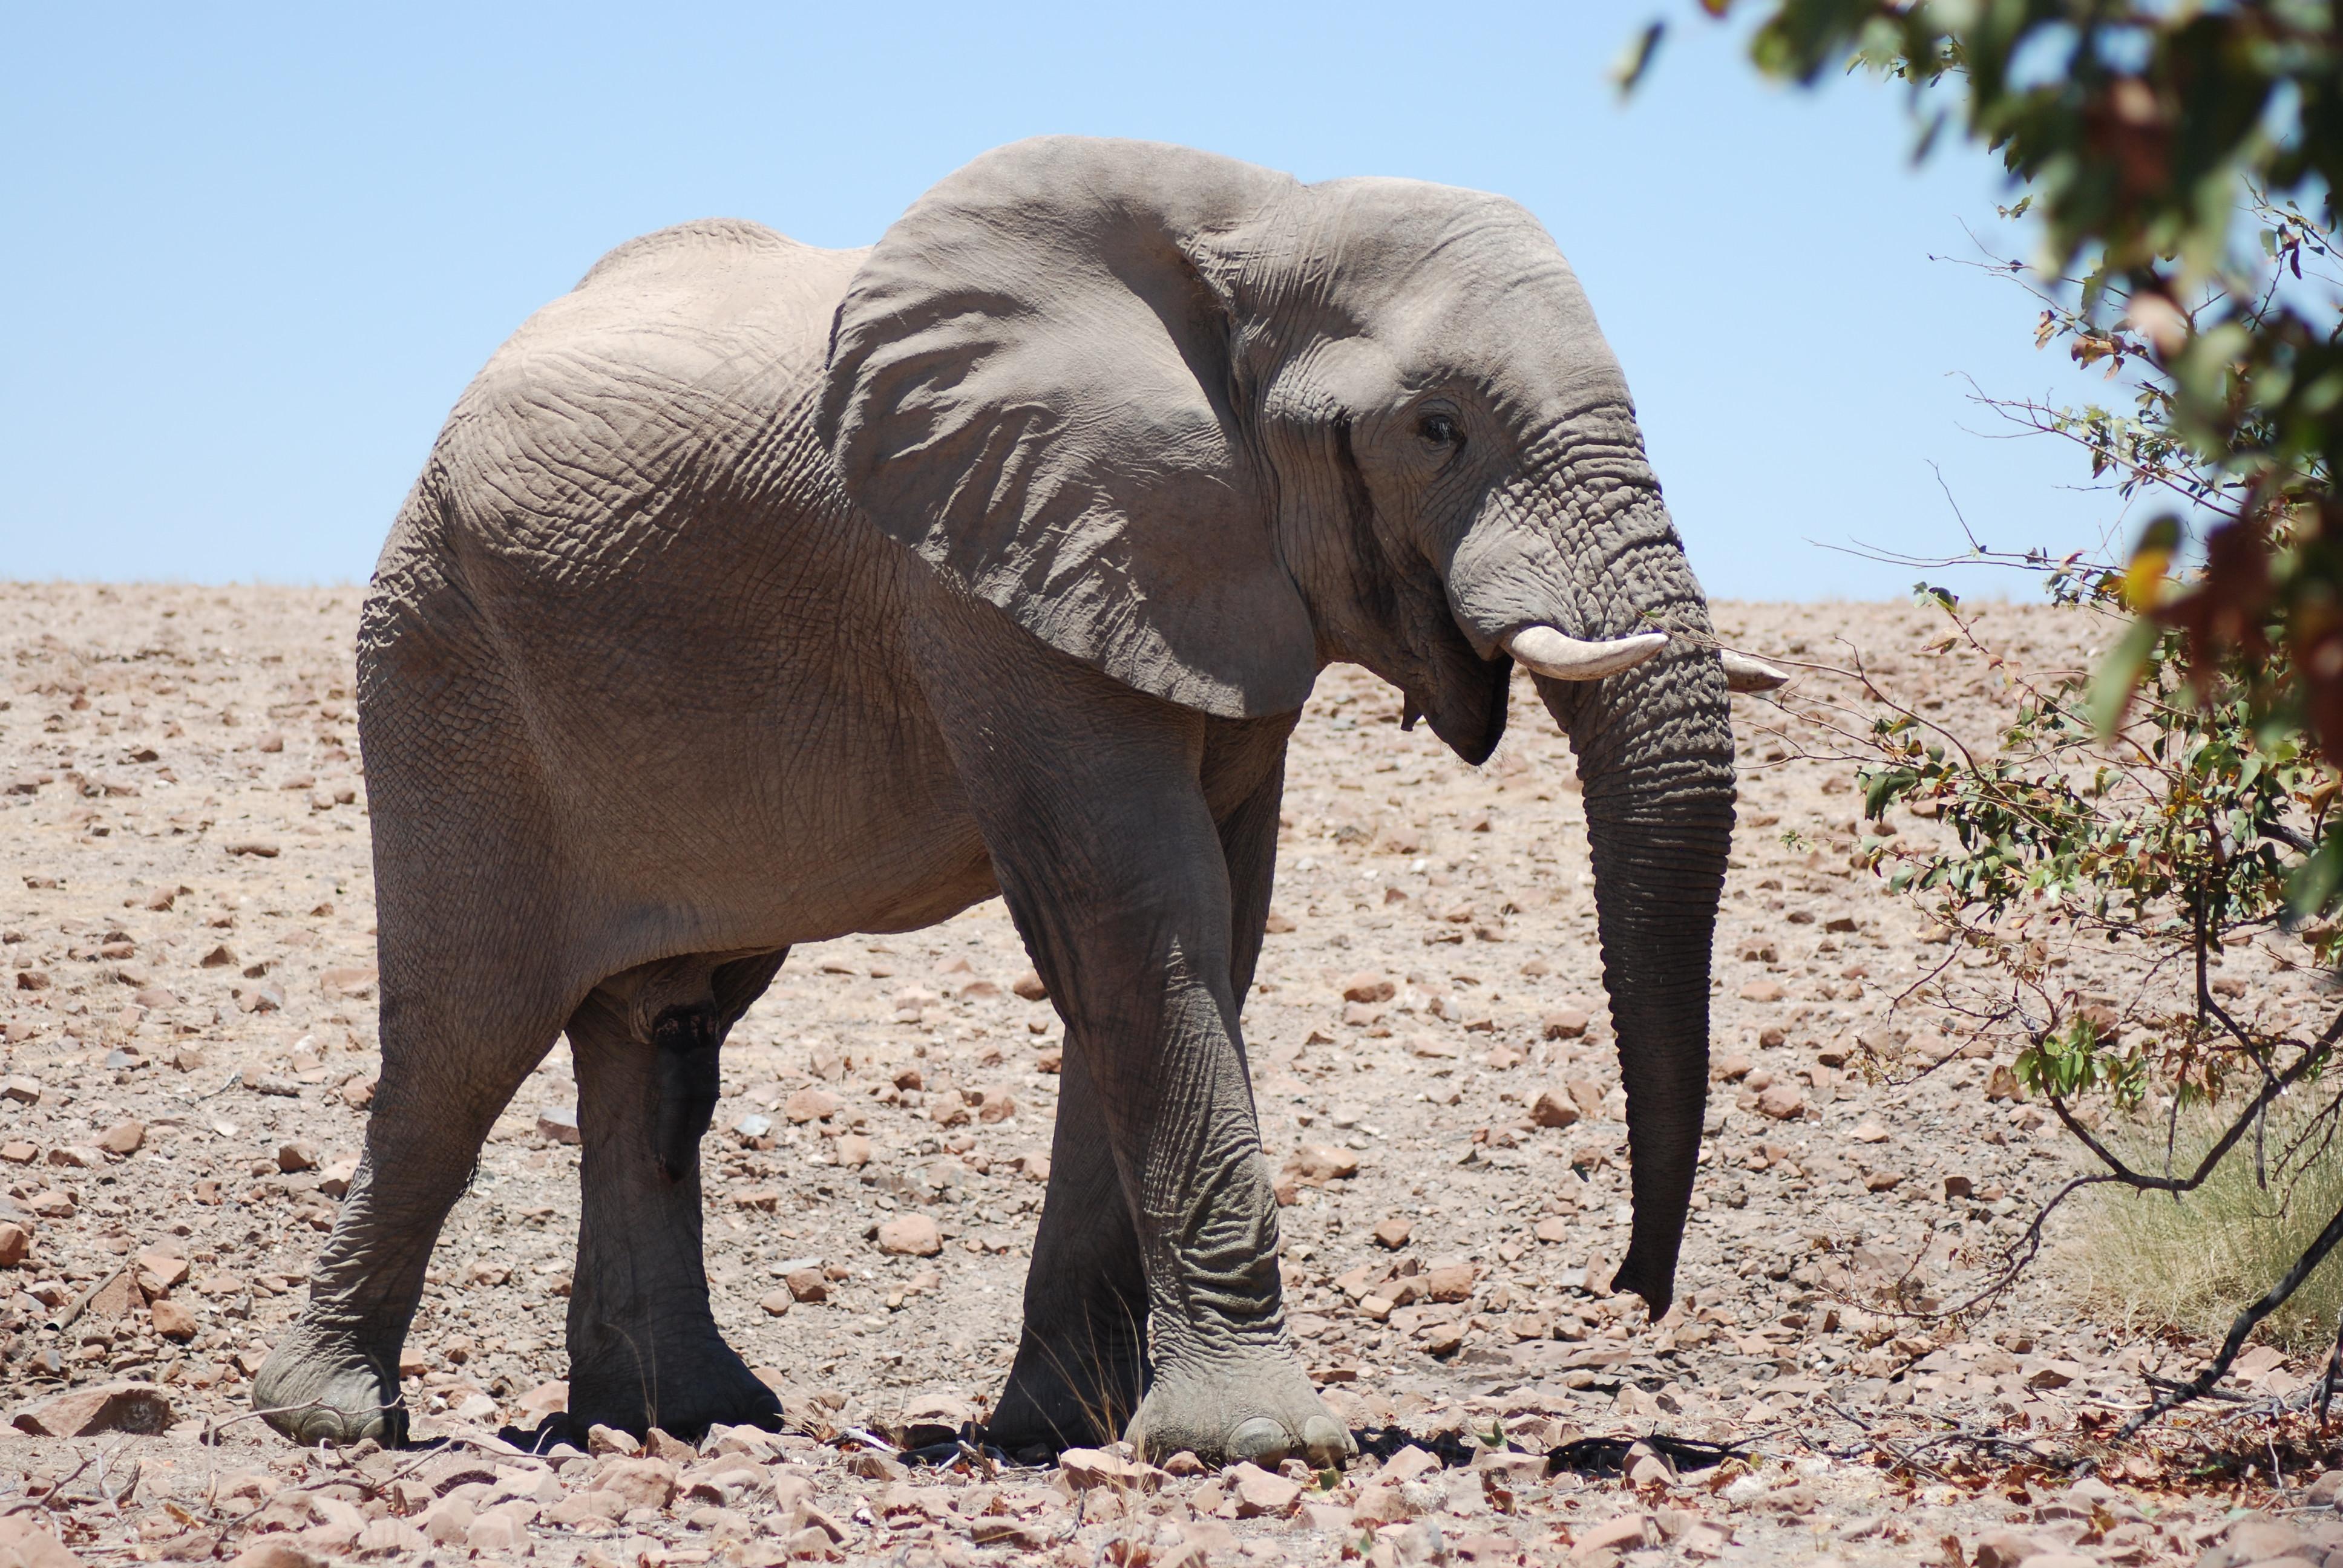 A Desert Elephant Encounter